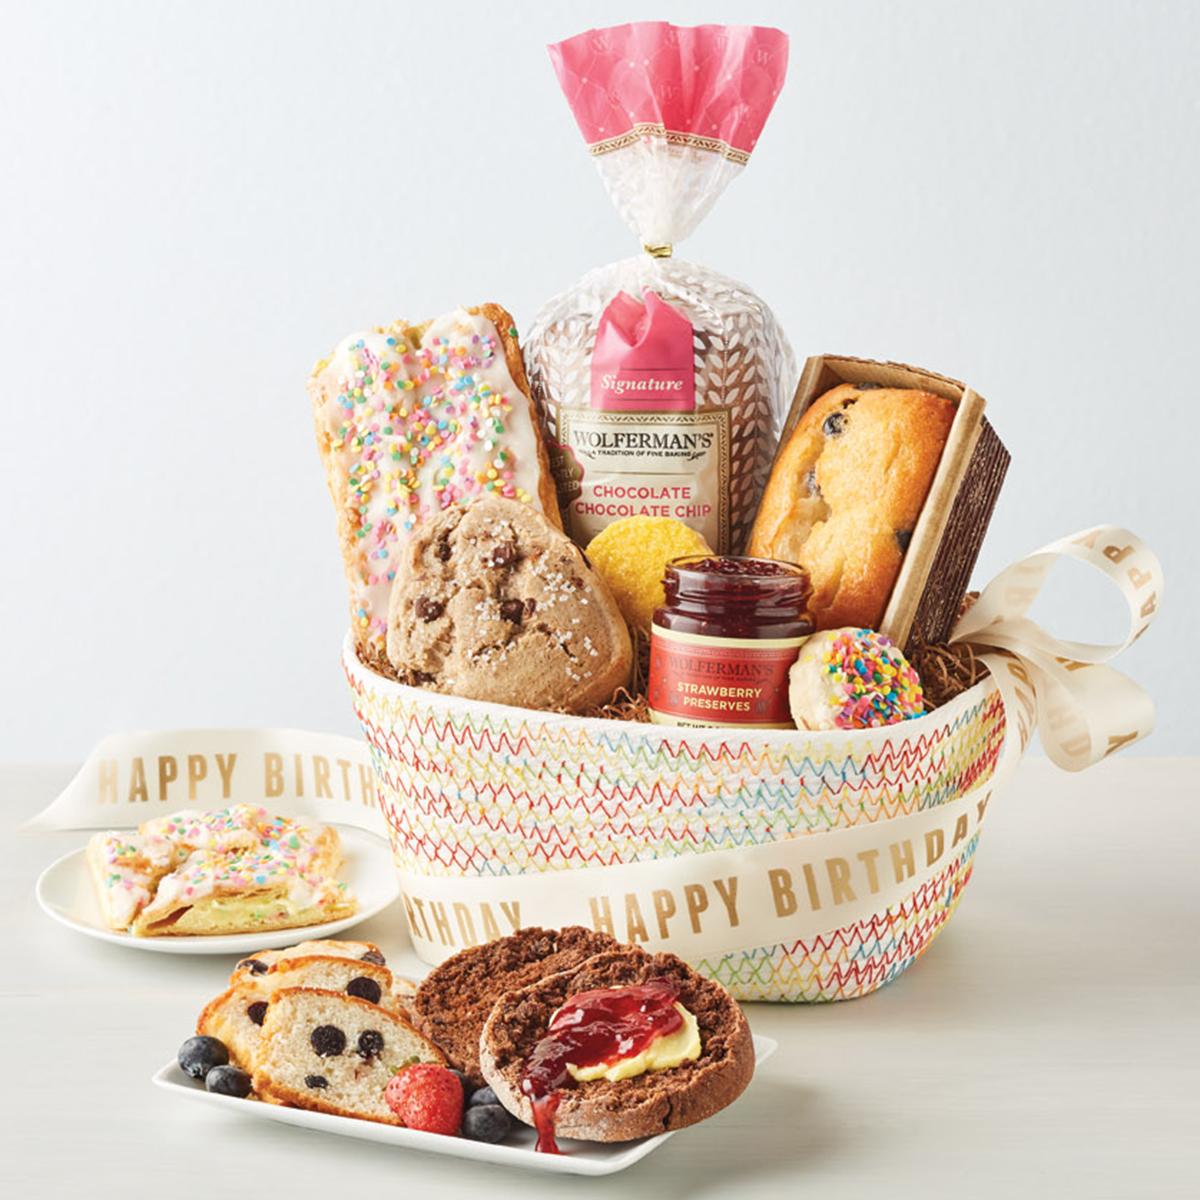 Wolferman's Bakery birthday breakfast gift